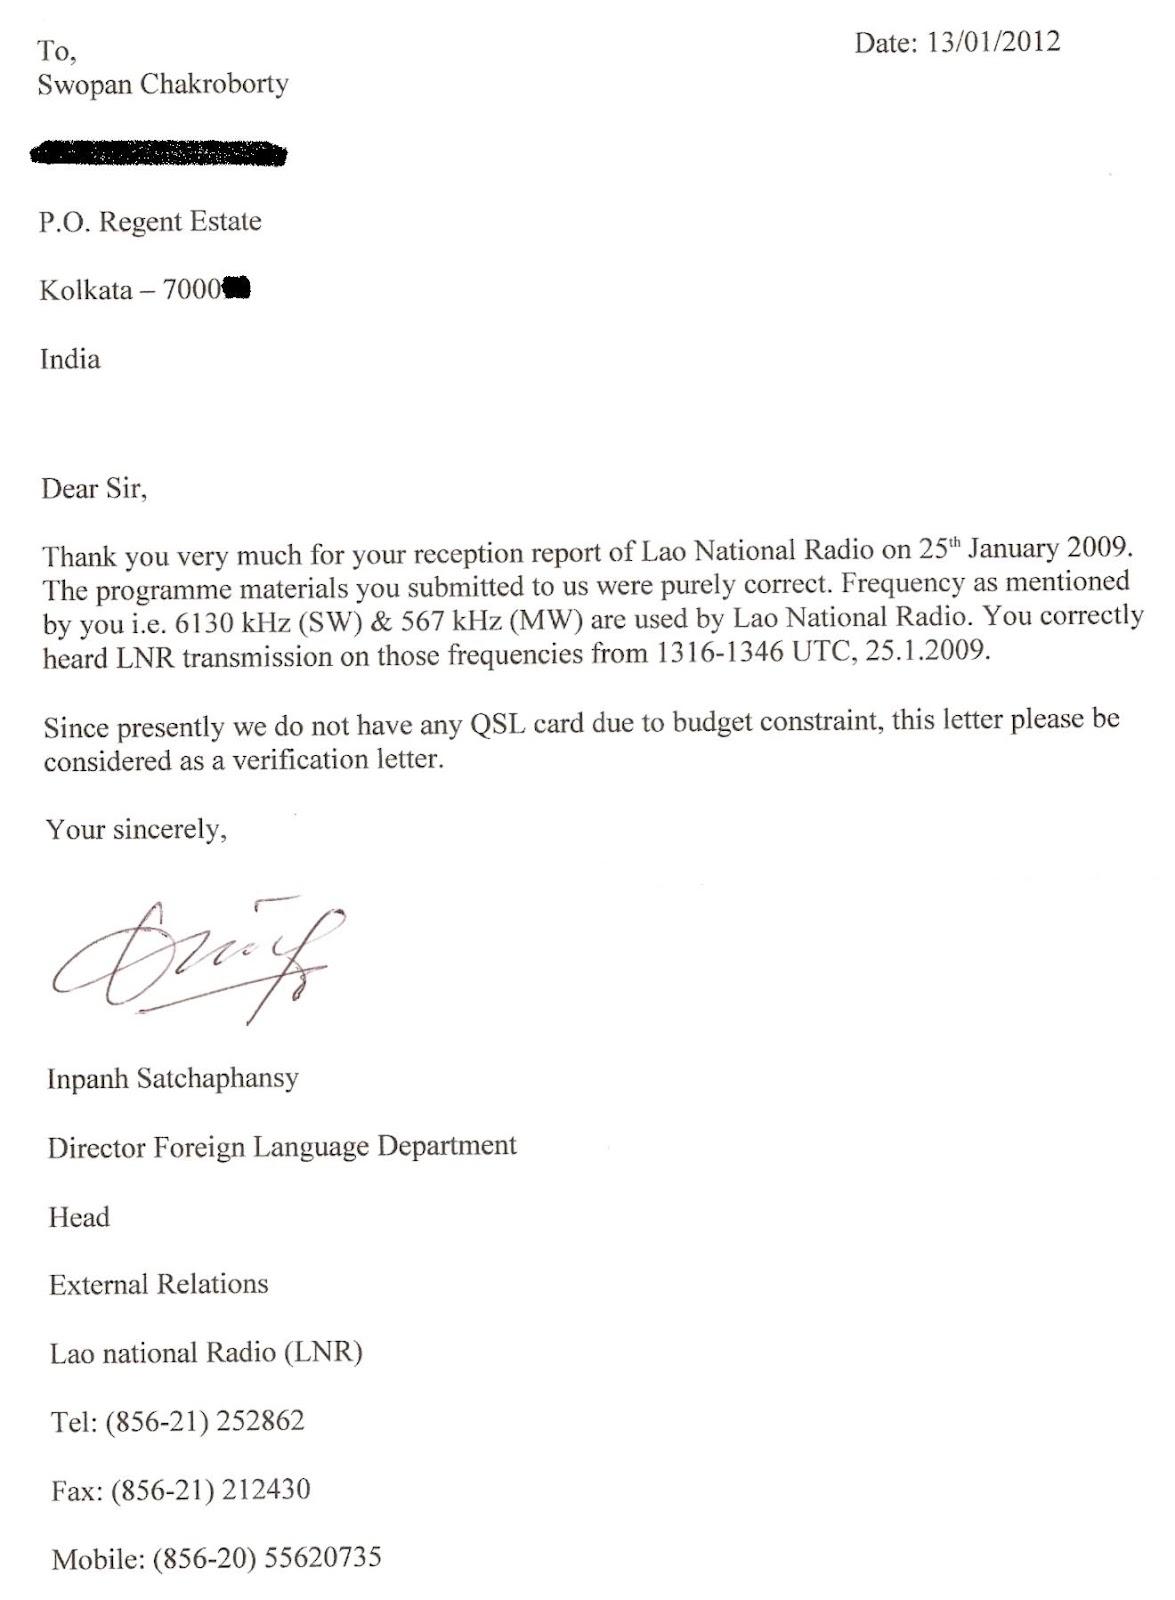 Employment Verification Letter Microsoft Word Template – Employment Verification Letter Template Microsoft